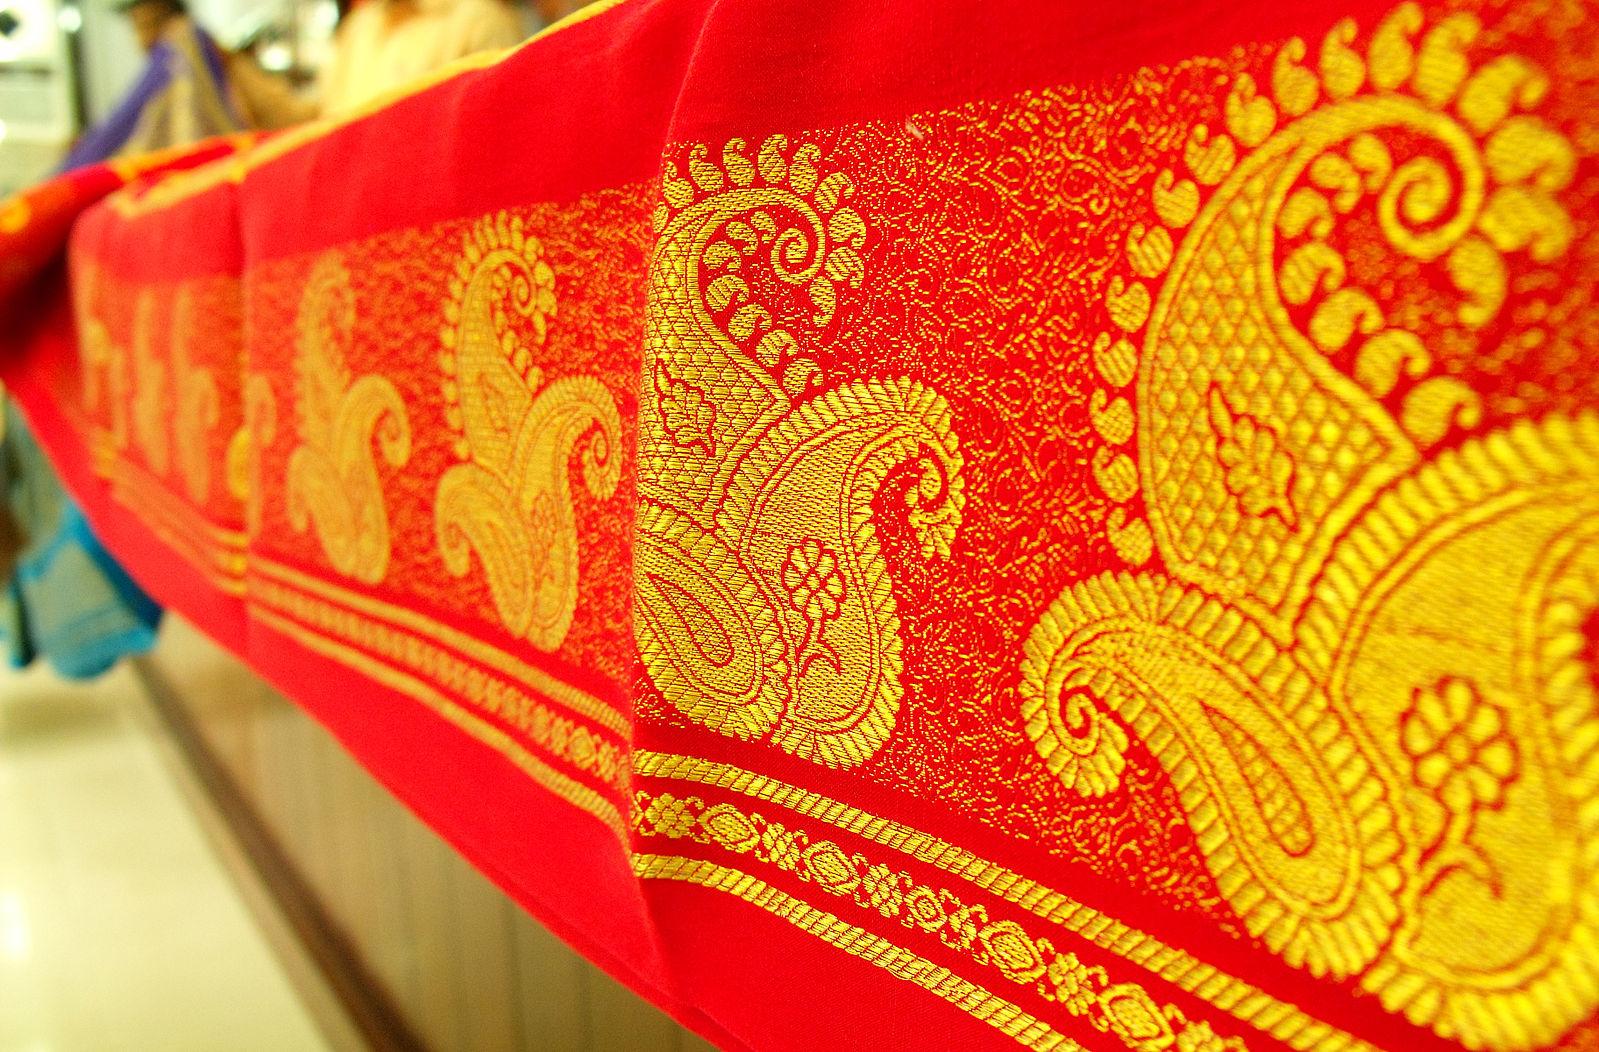 Difference Between Mysore Silk and Kanchipuram Silk